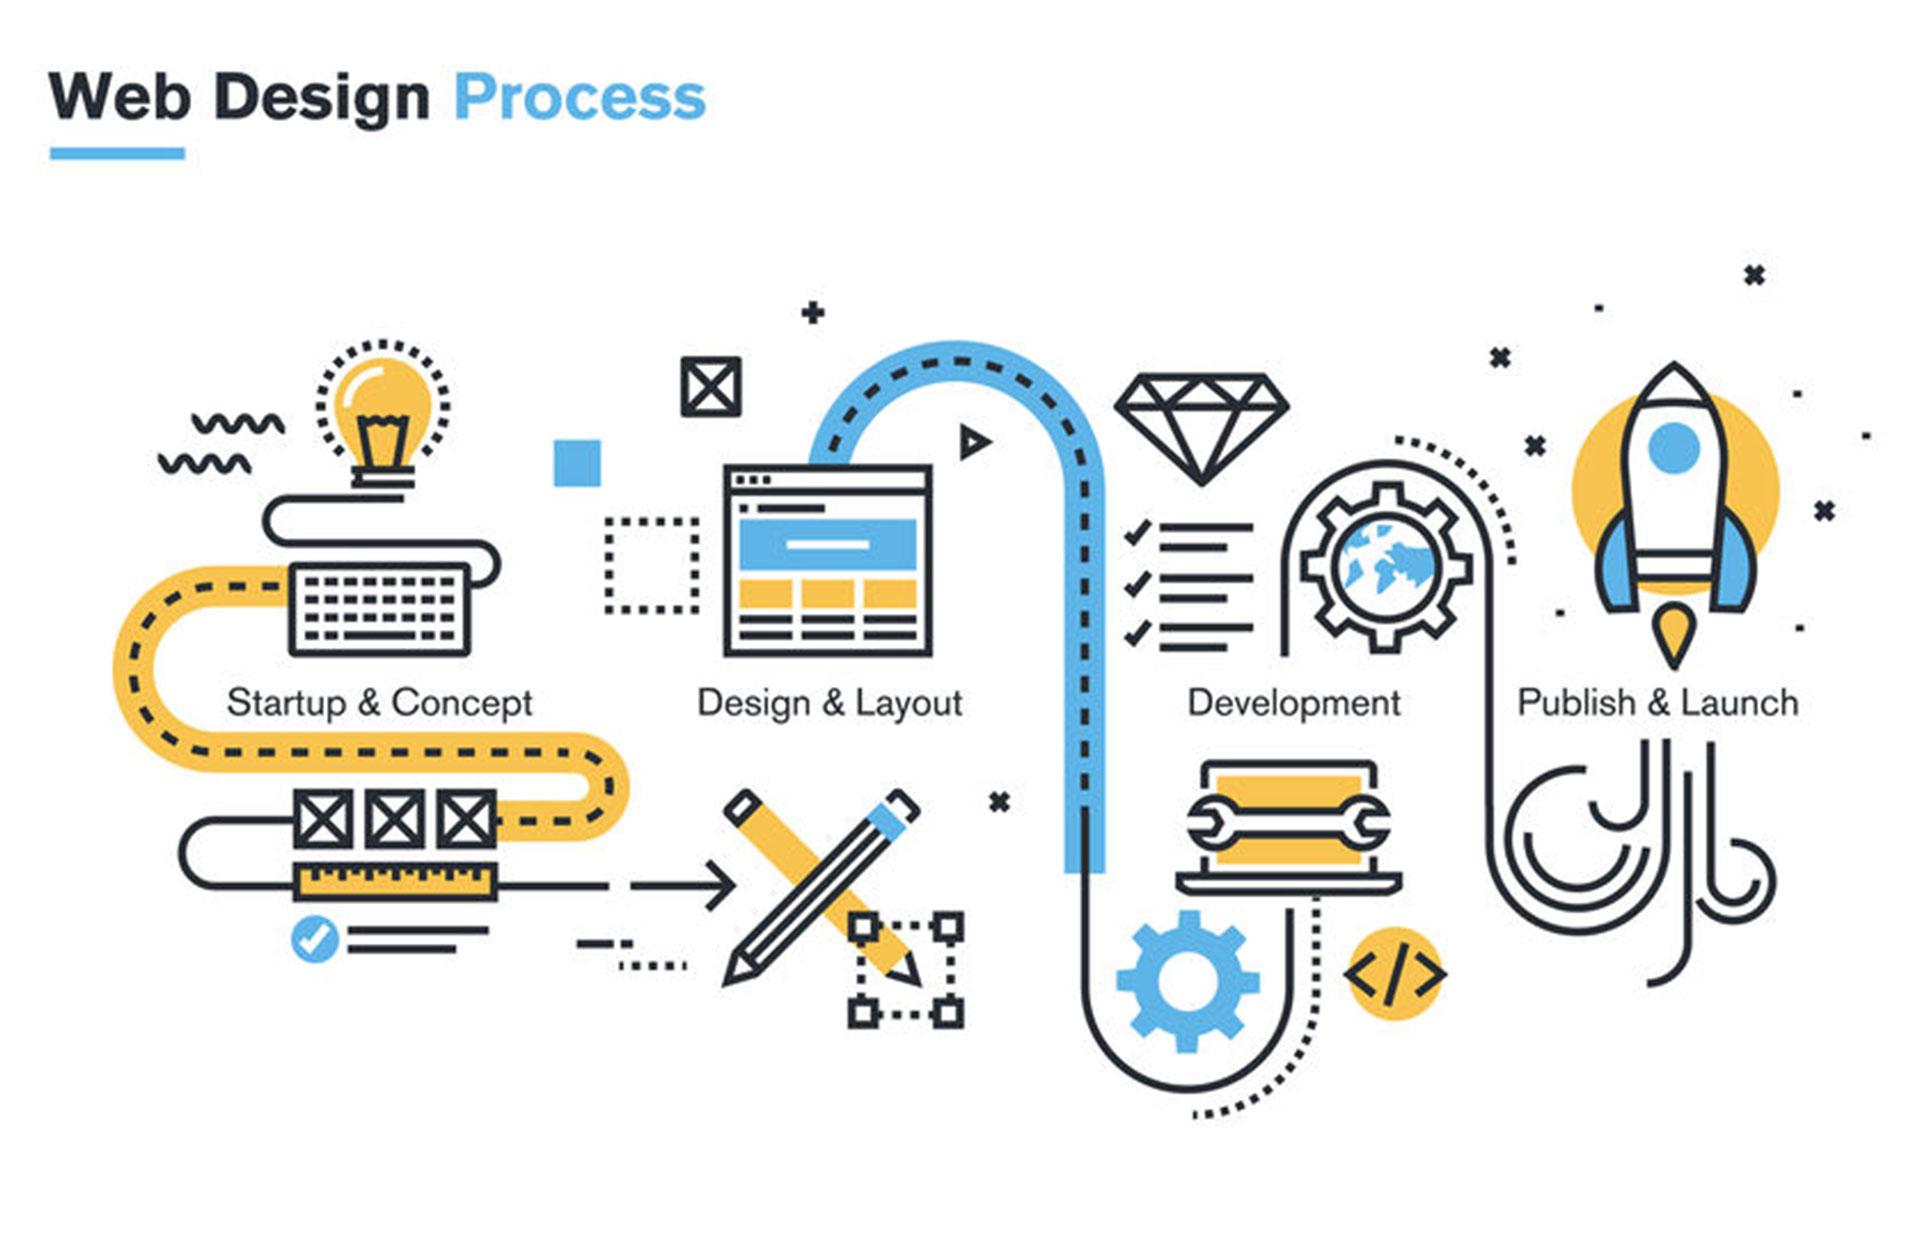 WebDesignProcess